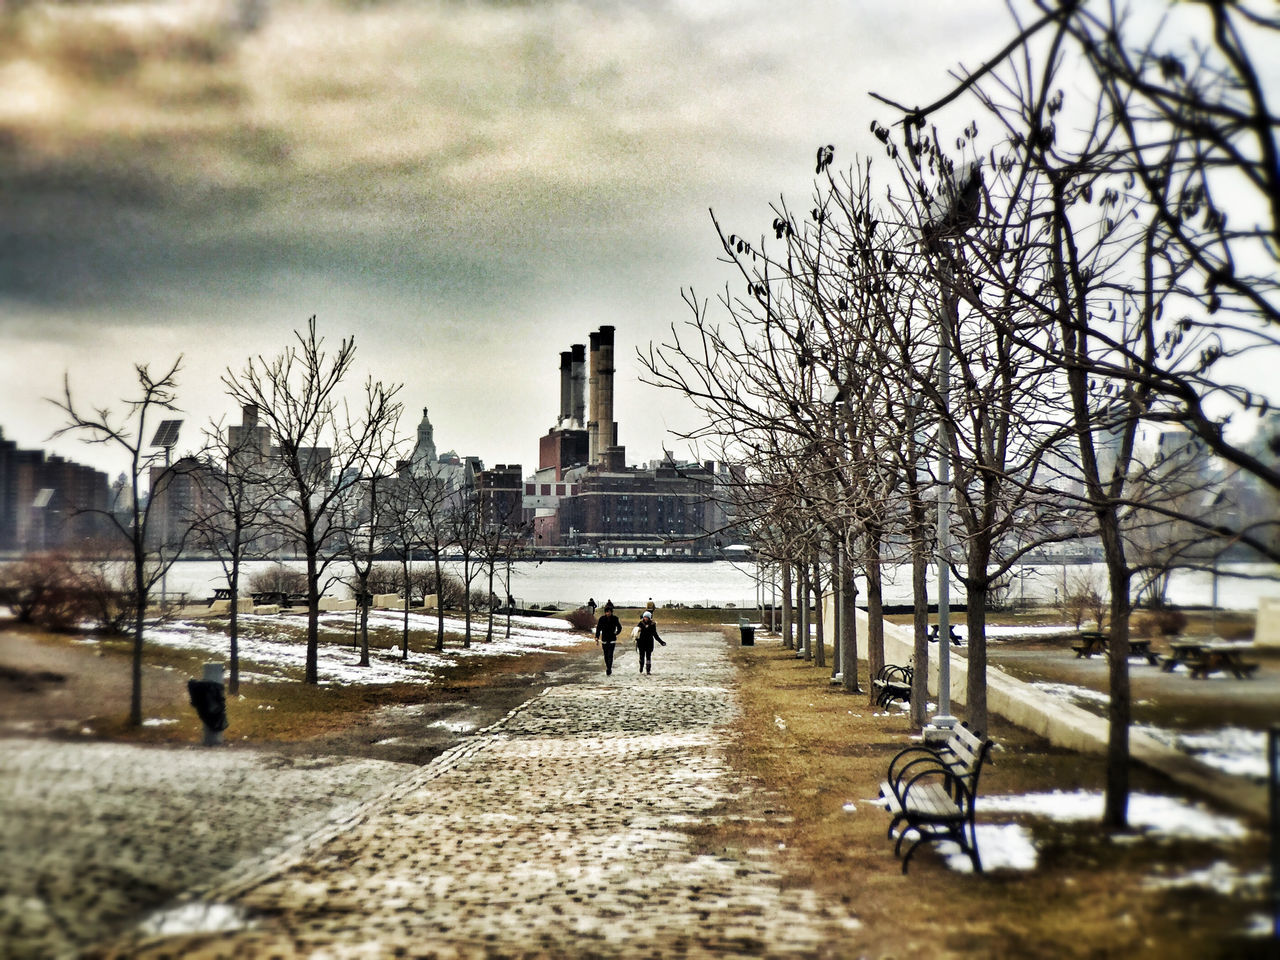 New York City Brooklyn Bushwickinletpark East River, NYC